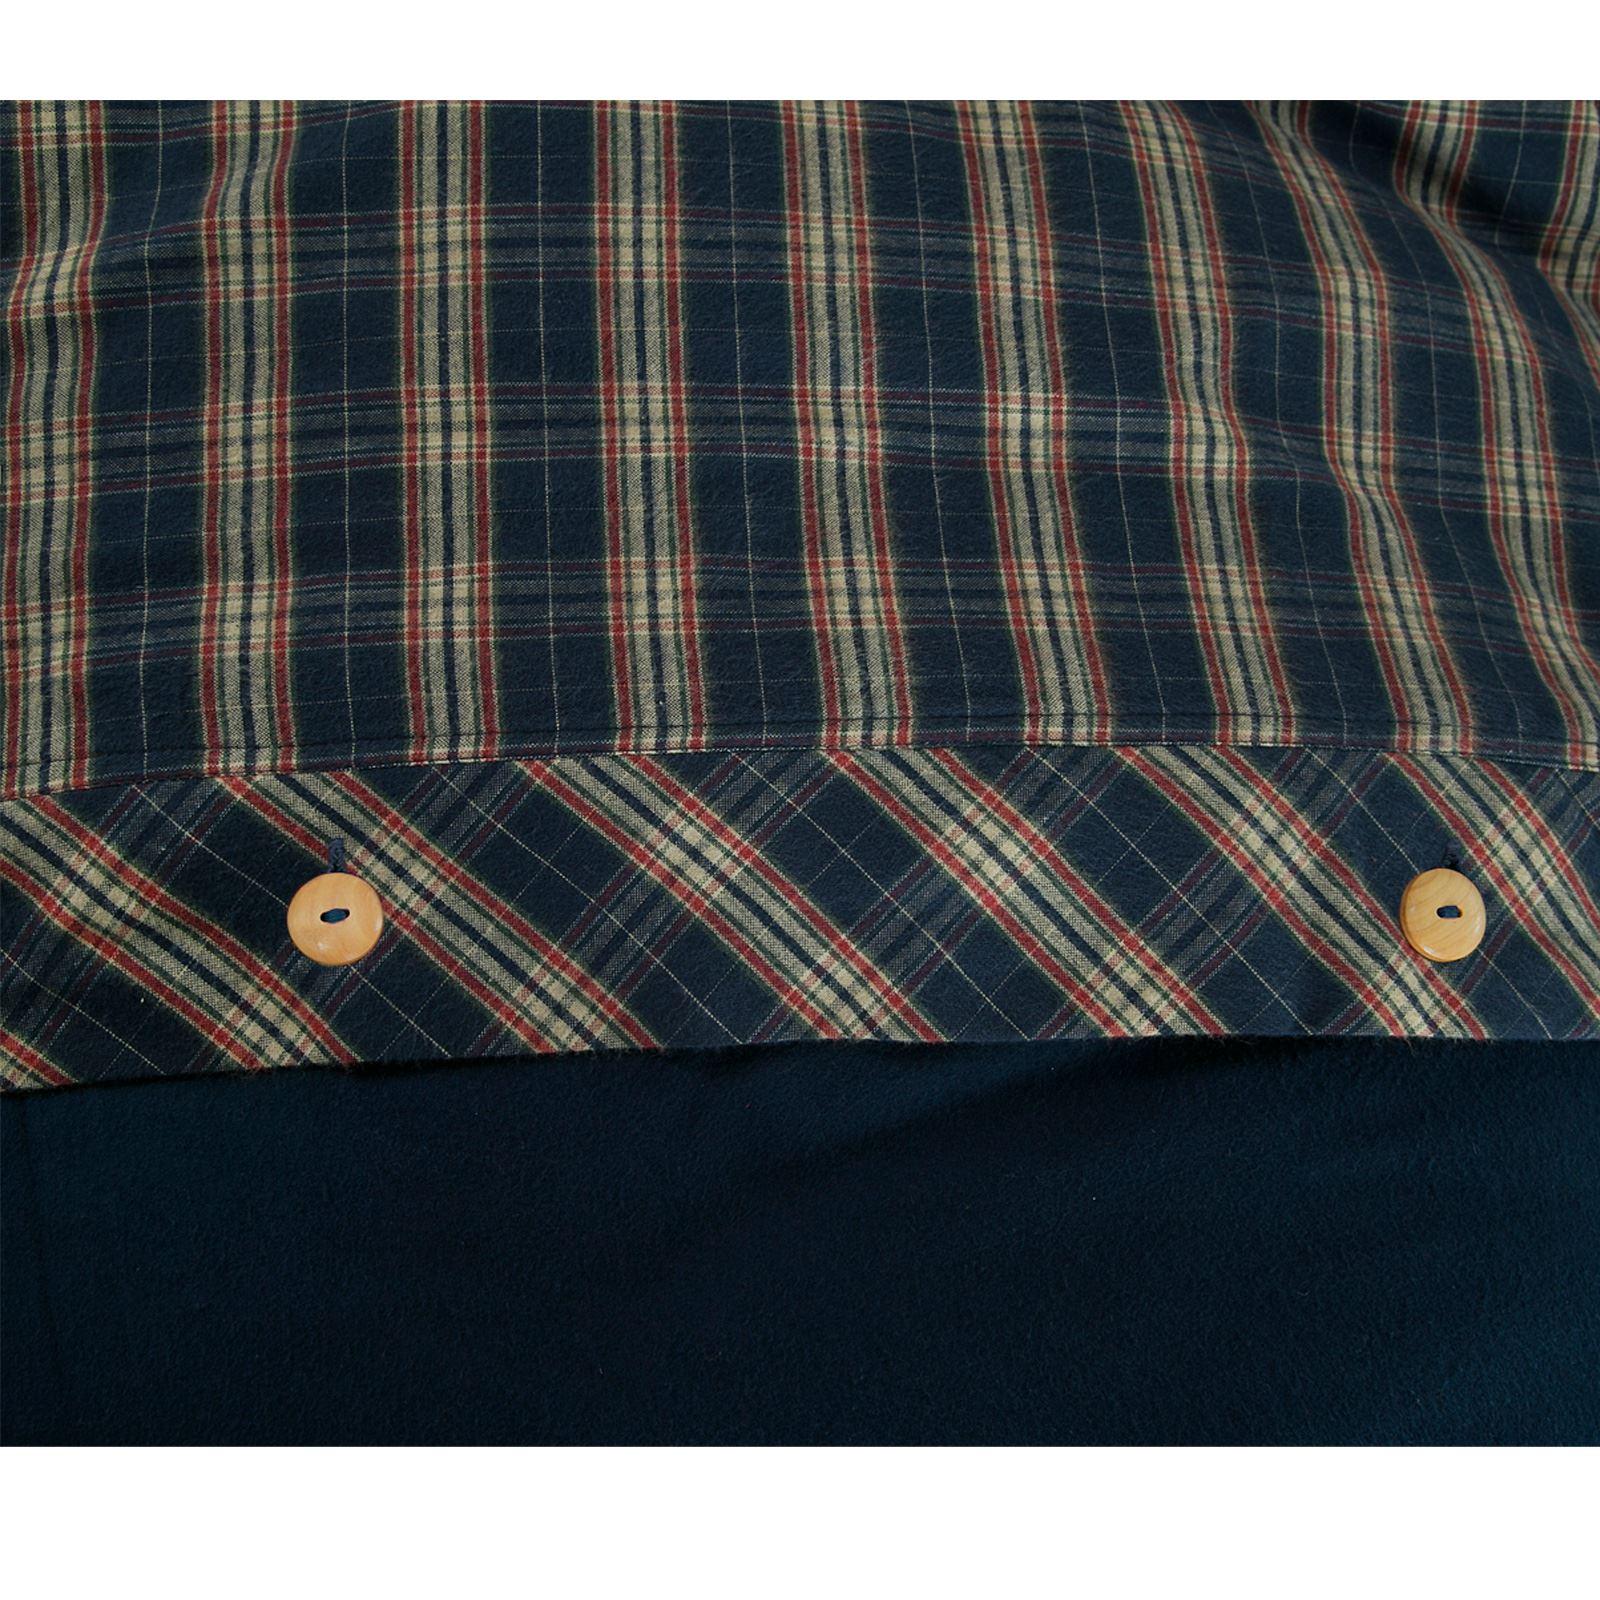 Highland Woven Tartan Check Brushed Cotton Thermal Flannelette Duvet Cover Set